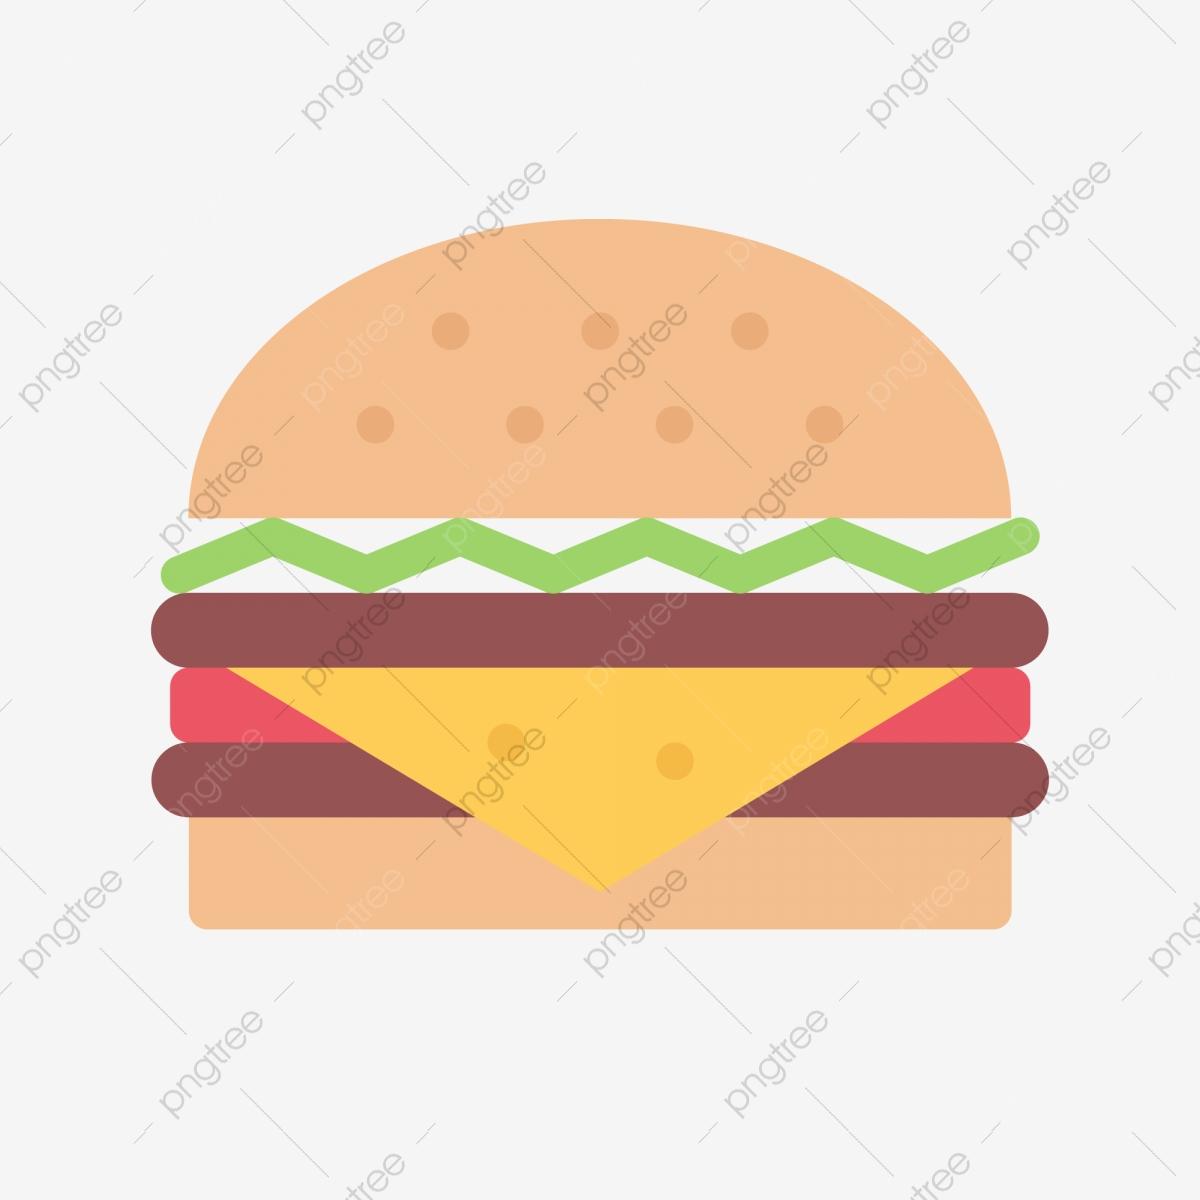 Delicious food mcdonalds icon. Hamburger clipart bread